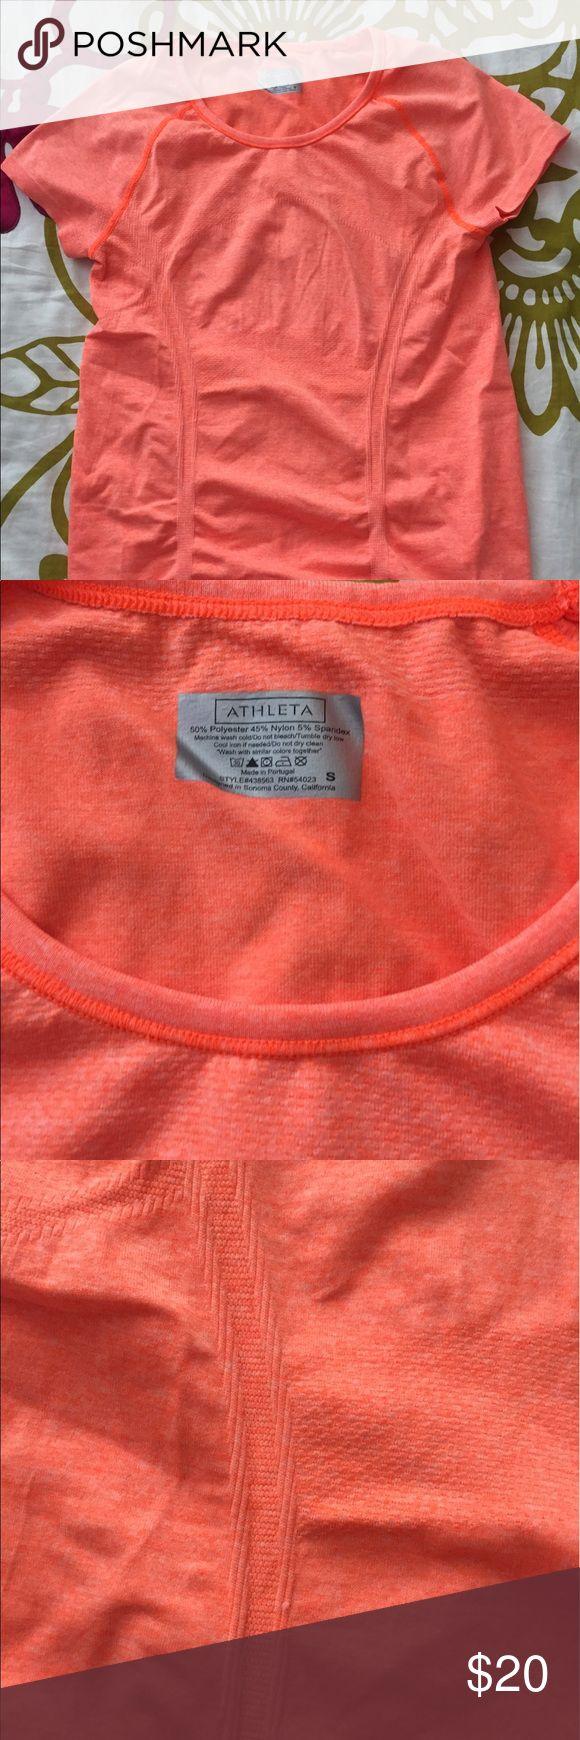 Athleta Orange Short Sleeve Athleta Orange short sleeve top, worn once and in perfect condition! Athleta Other